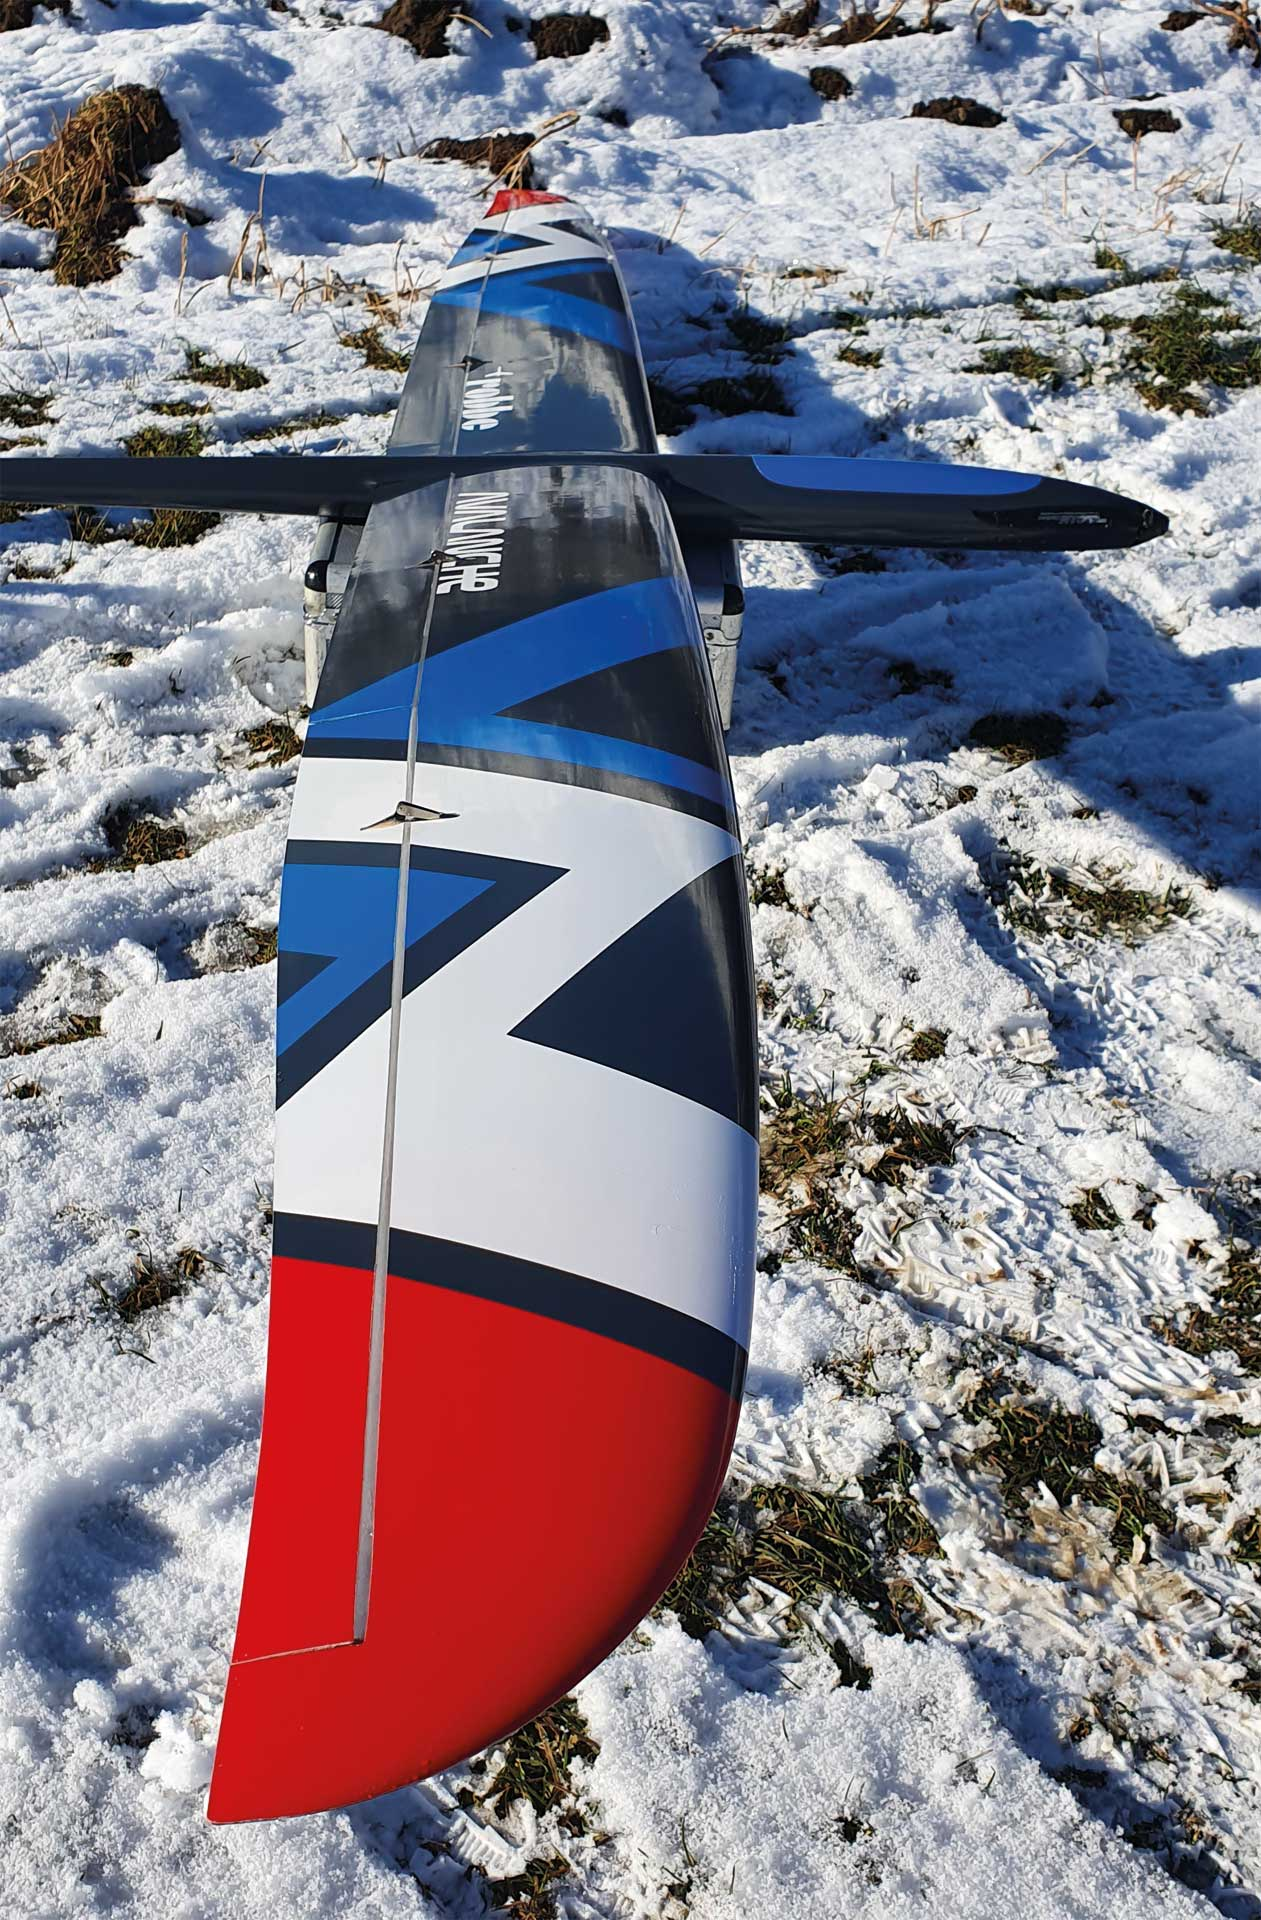 Robbe Modellsport AVALANCHE ARF VOLL-GFK/CFK 2,8M ELEKTRO